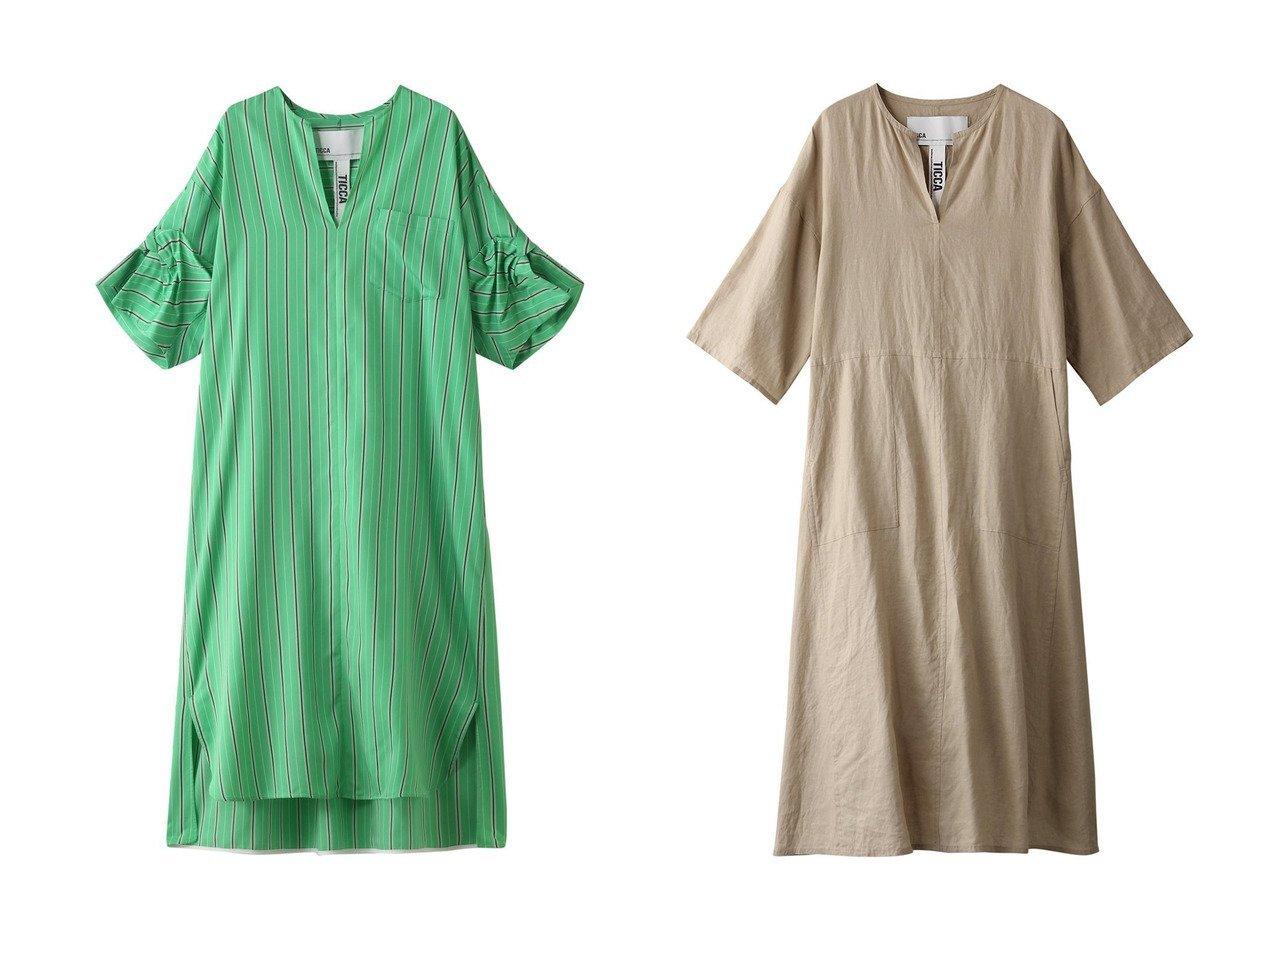 【TICCA/ティッカ】のツイストスリーブストライプワンピース&キーネックロングリネンドレス ワンピース・ドレスのおすすめ!人気、トレンド・レディースファッションの通販 おすすめで人気の流行・トレンド、ファッションの通販商品 メンズファッション・キッズファッション・インテリア・家具・レディースファッション・服の通販 founy(ファニー) https://founy.com/ ファッション Fashion レディースファッション WOMEN ワンピース Dress ドレス Party Dresses 2021年 2021 2021 春夏 S/S SS Spring/Summer 2021 S/S 春夏 SS Spring/Summer スクエア ストライプ レギンス ロング 春 Spring |ID:crp329100000015041